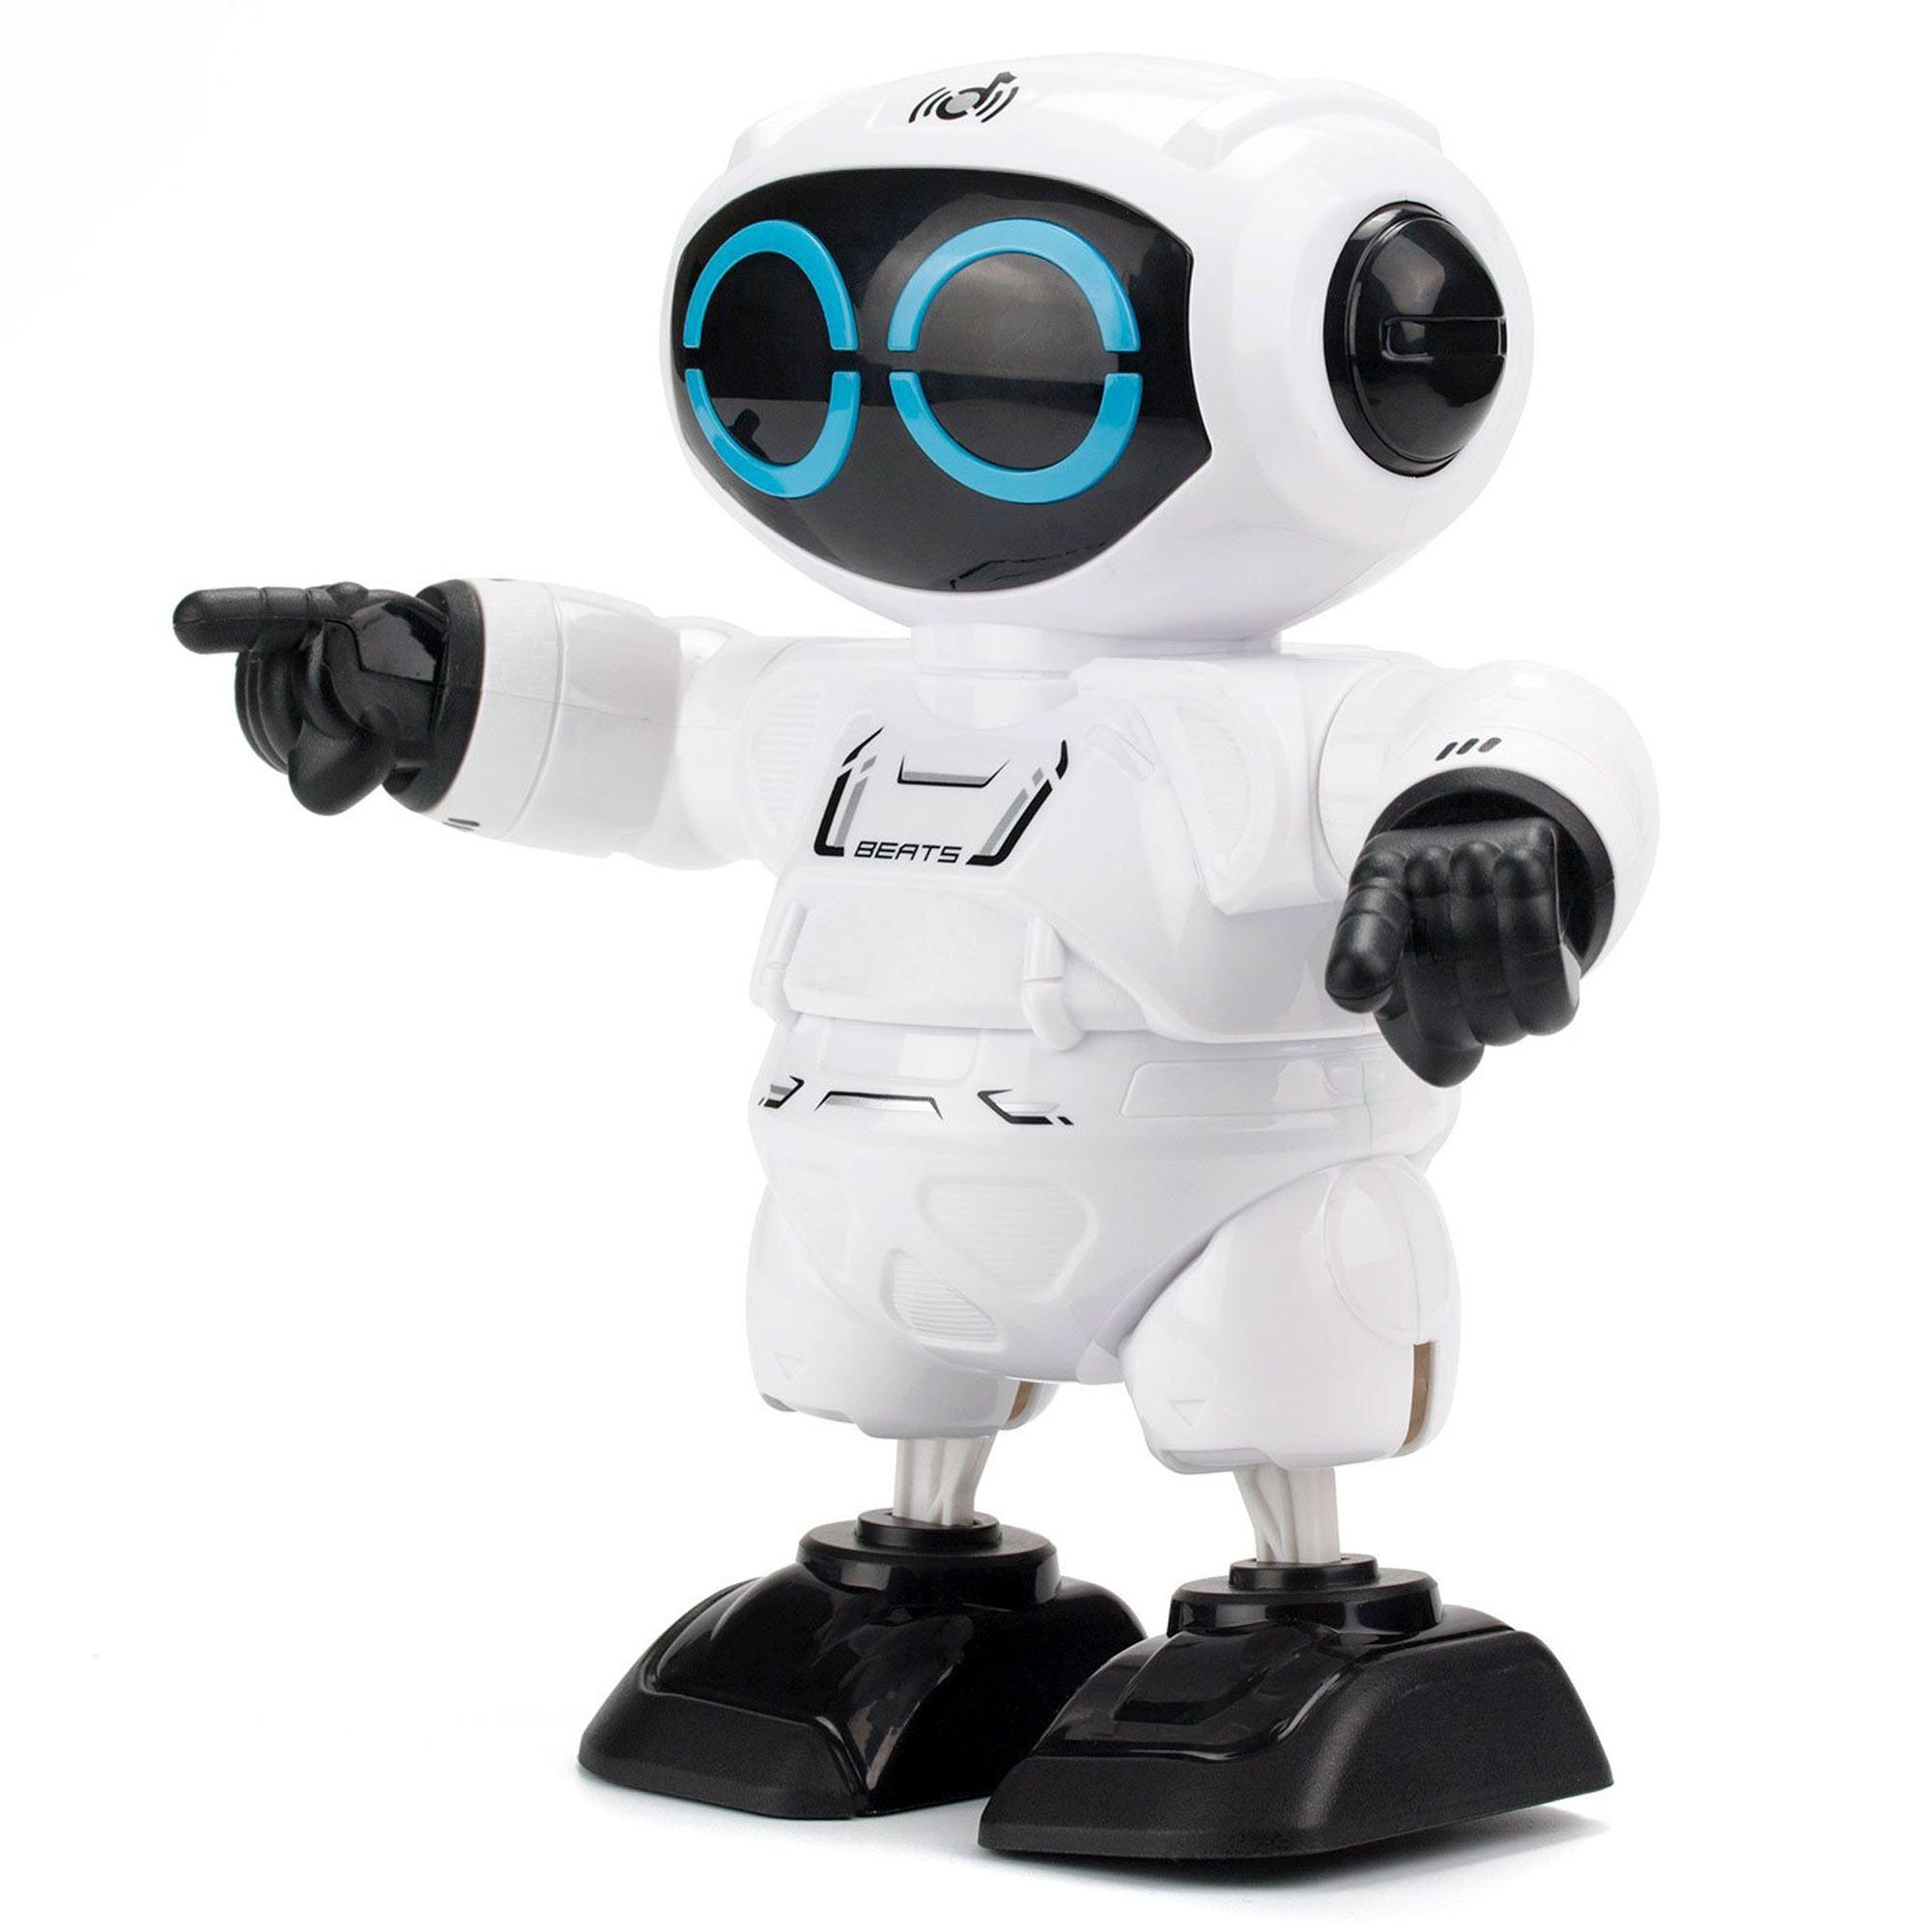 Робот Silverlit Битс